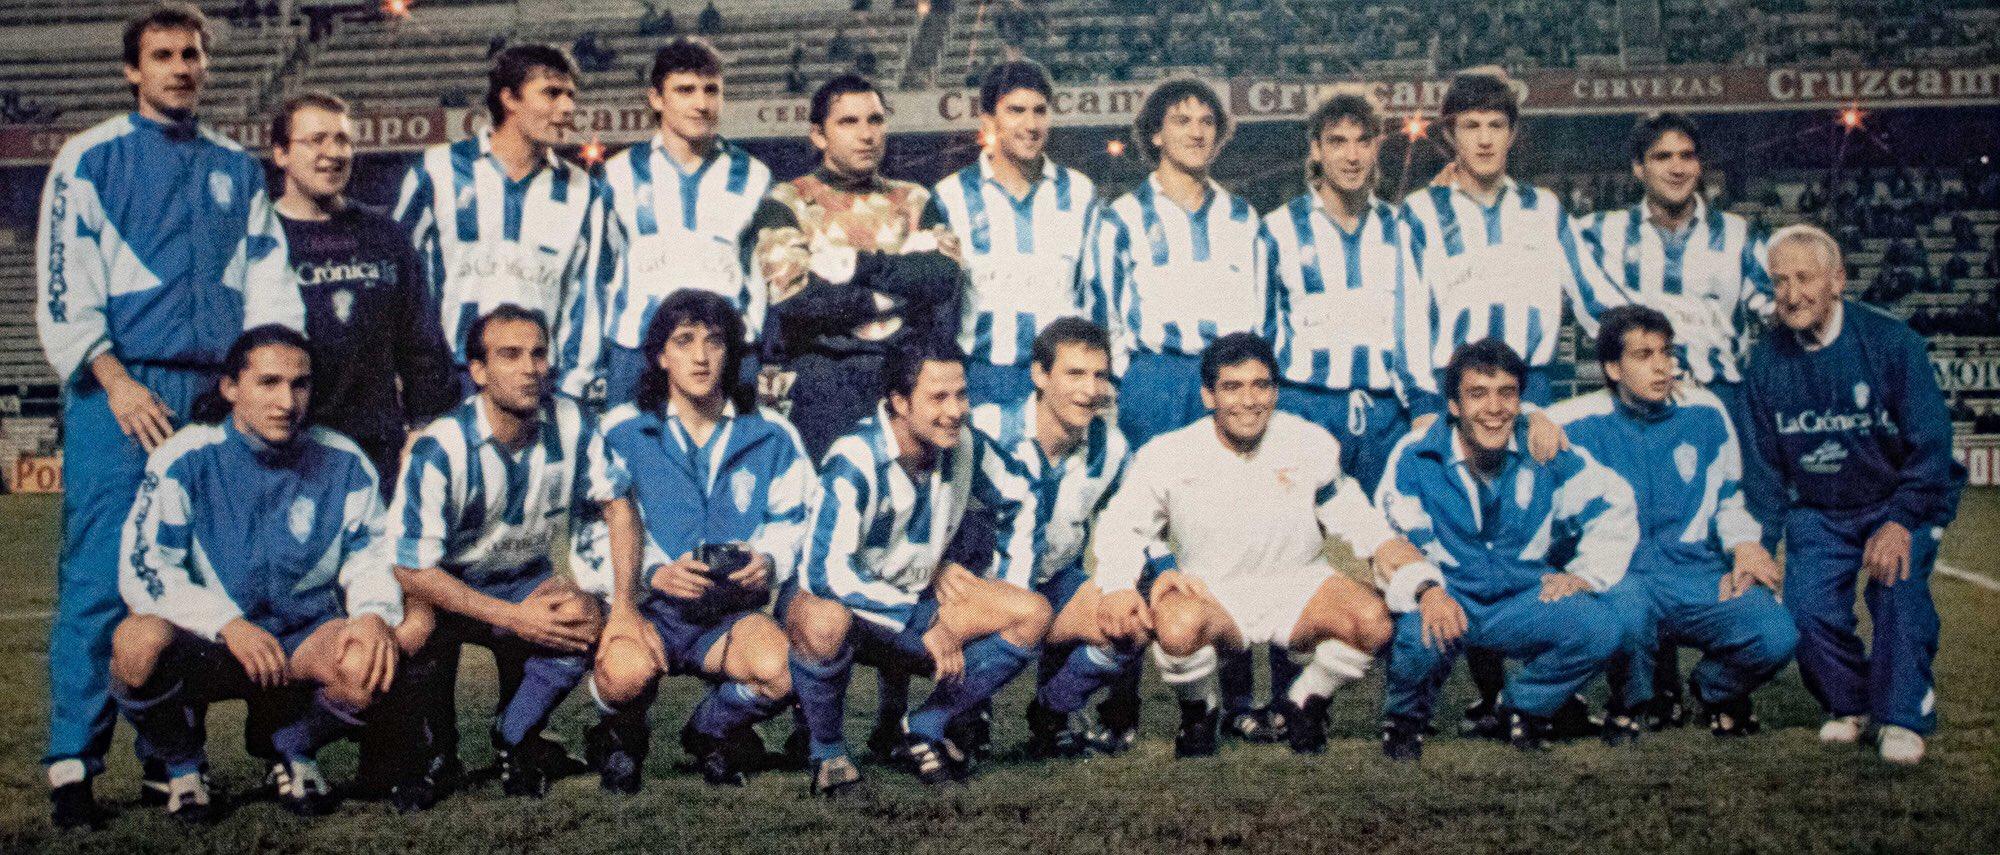 Fallece Diego Armando Maradona 3